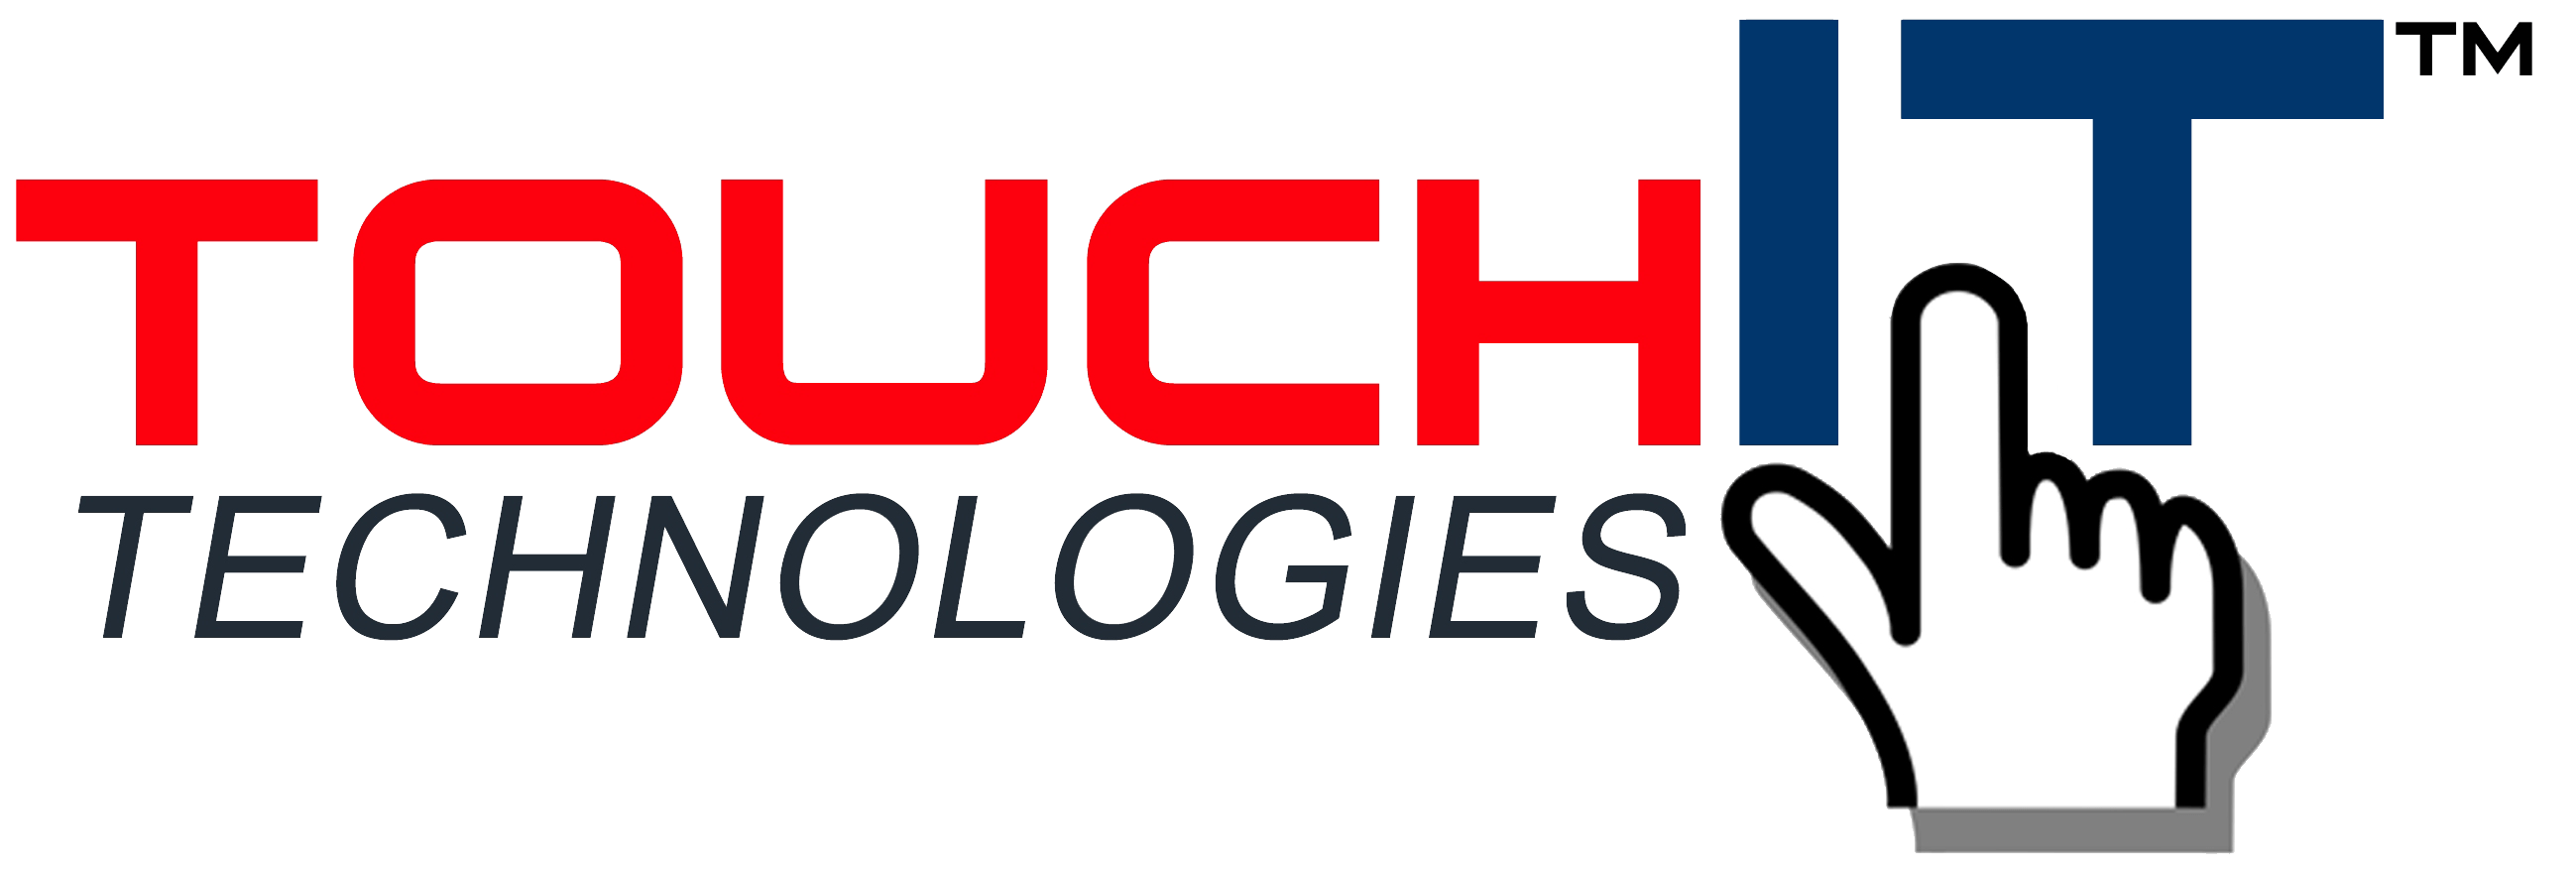 TouchIT Technologies Logo